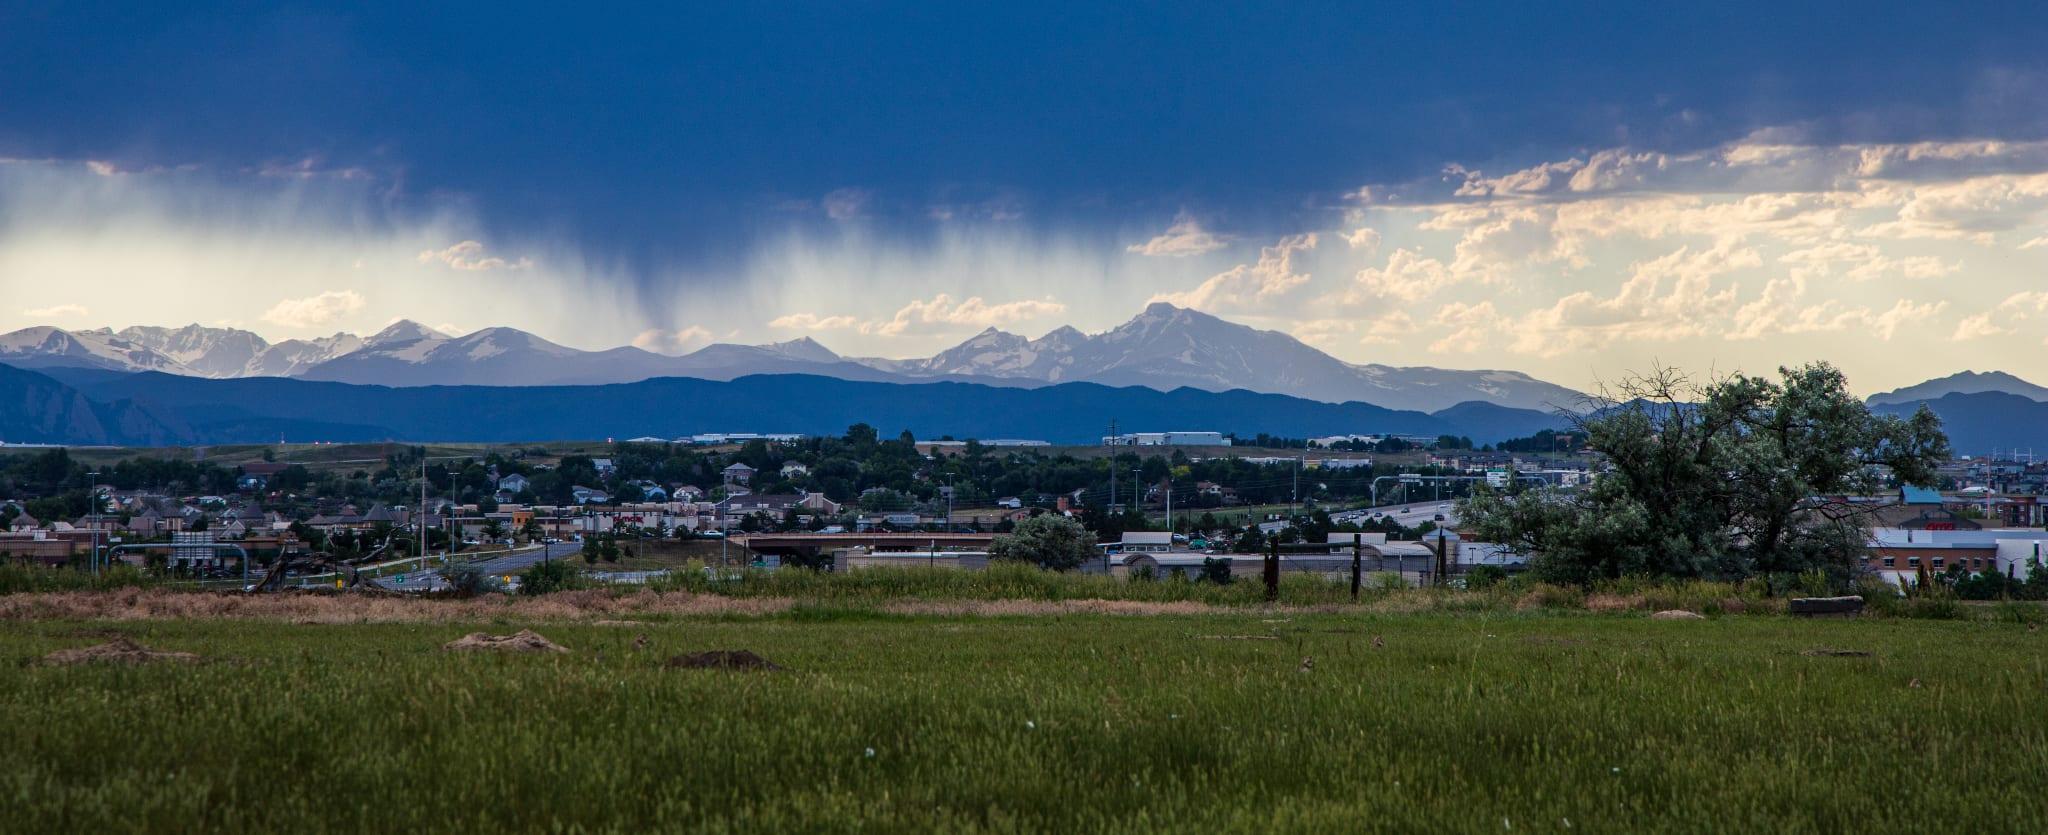 Colorado Front Range Longs Peak Hyland Ponds Open Space